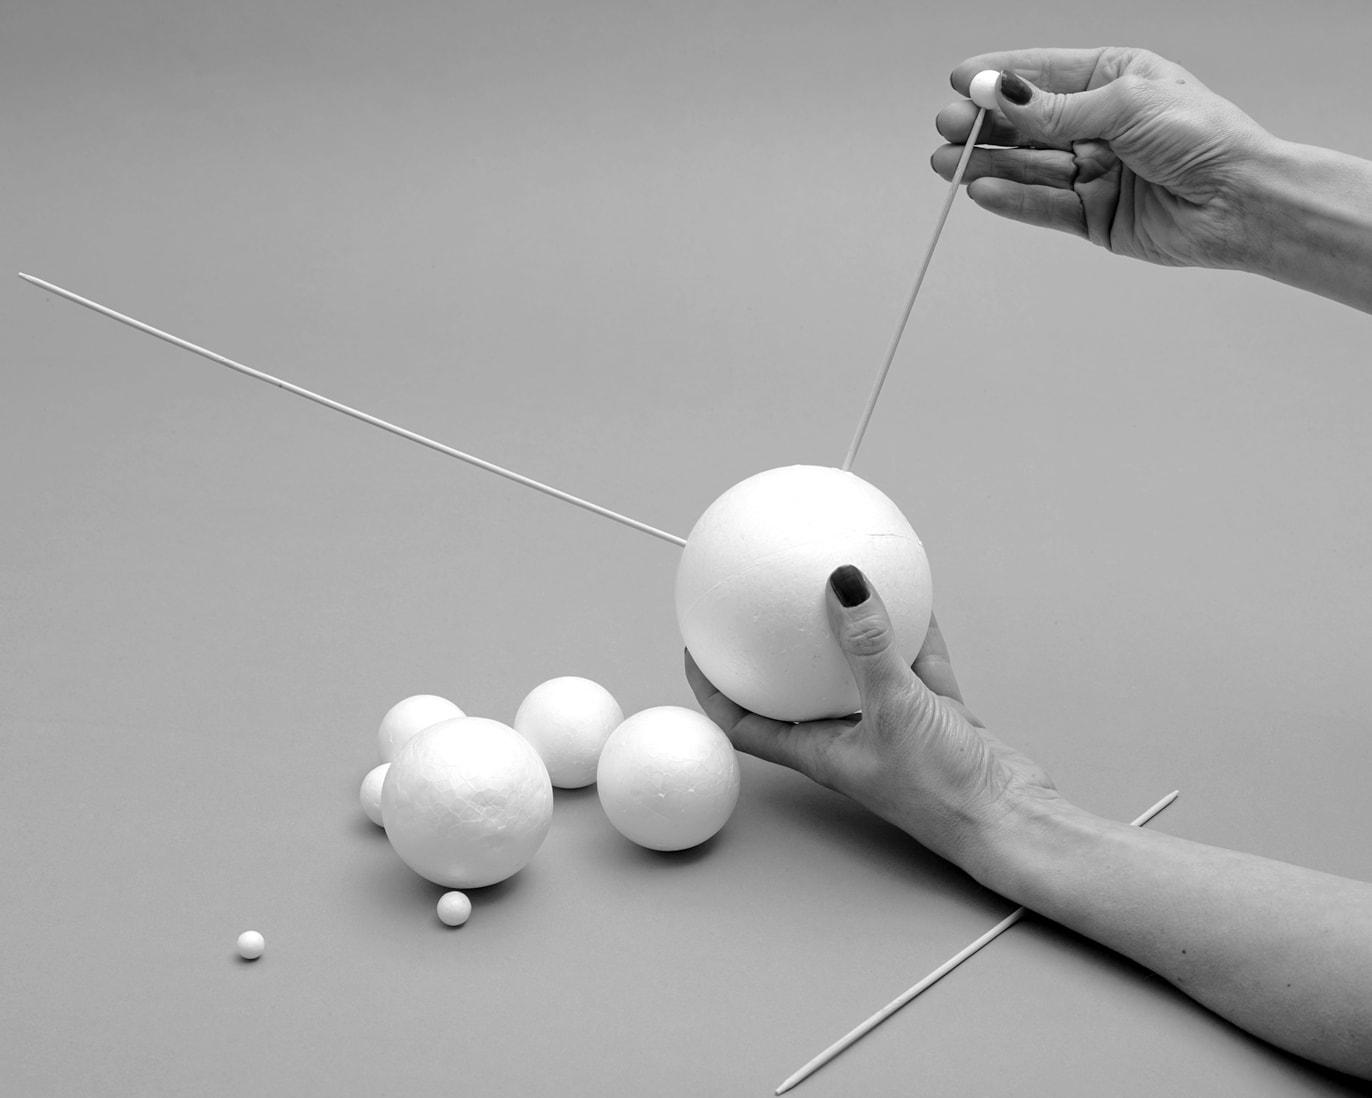 Marina Gadonneix, Untitled (Building a Solar System #1), 2014